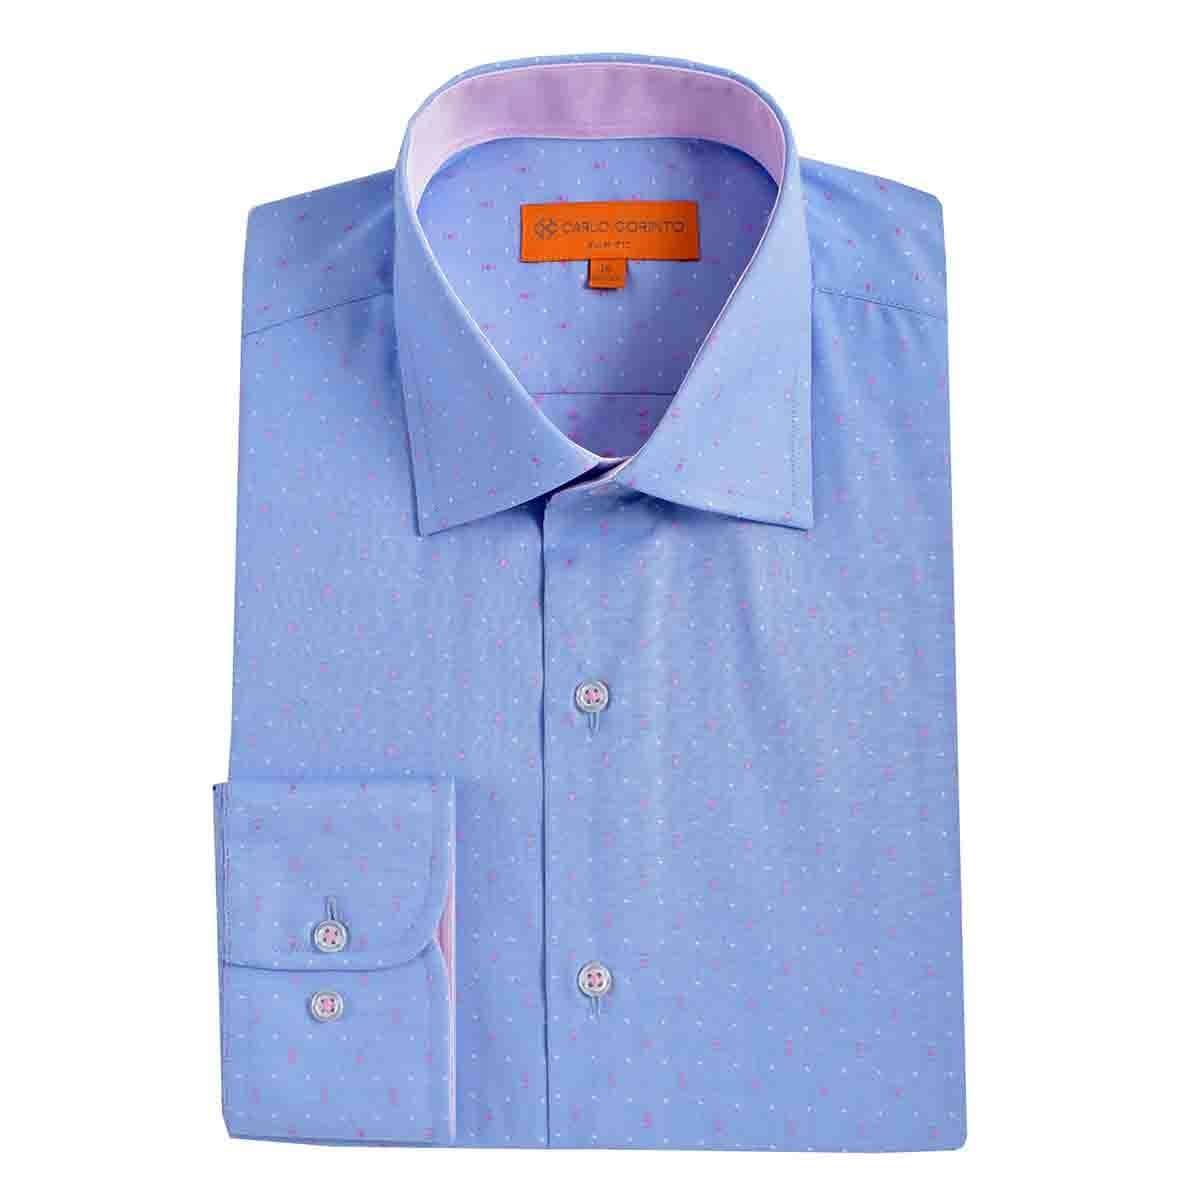 Camisa de Vestir Slim Fit Azul Secf-0719 Carlo Corinto